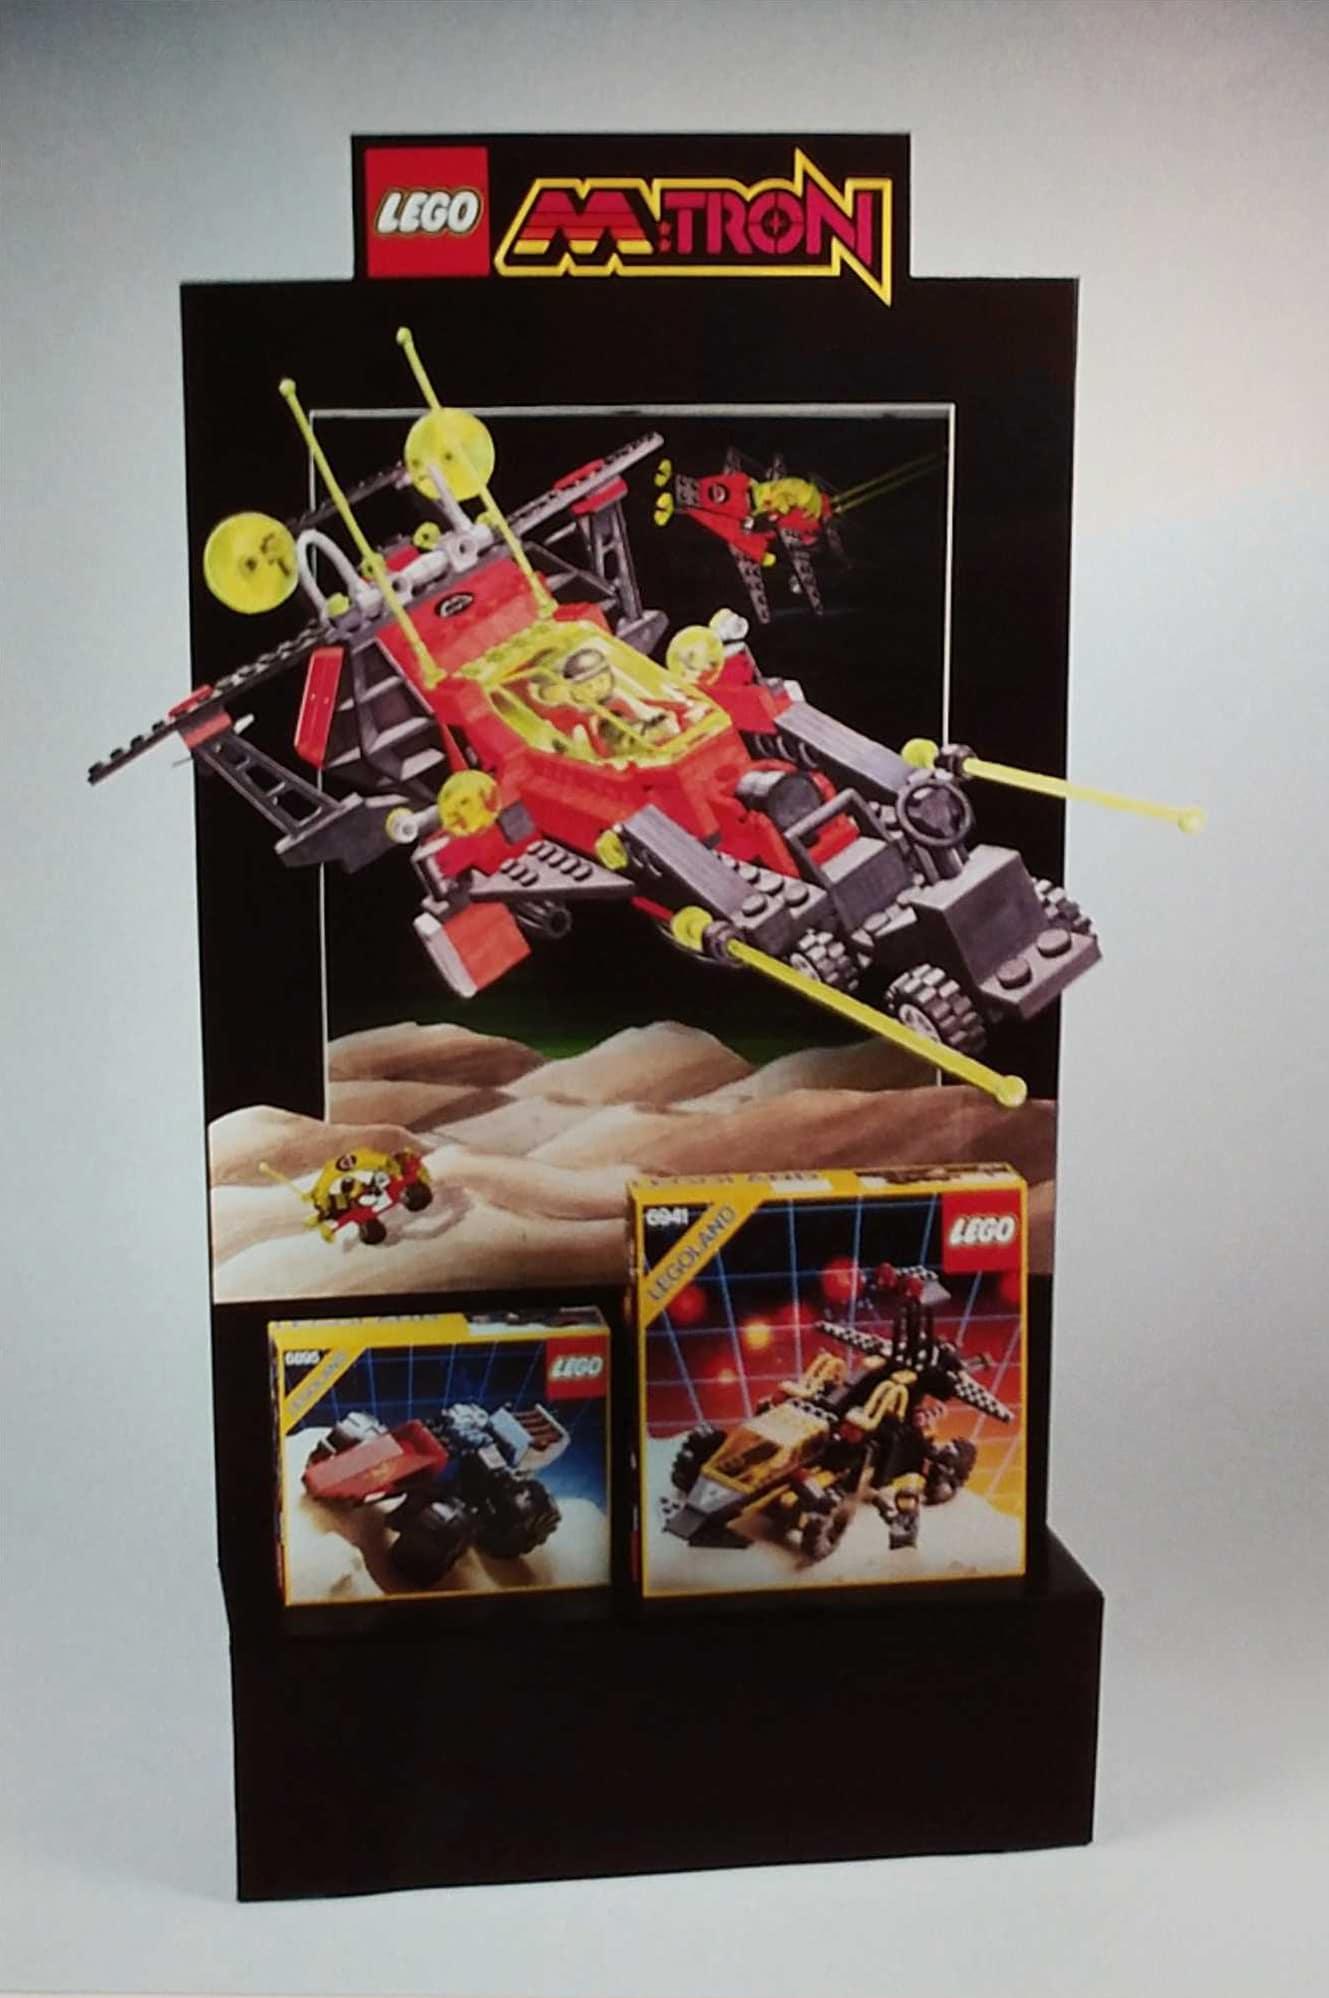 LEGO M Tron Shopdisplay